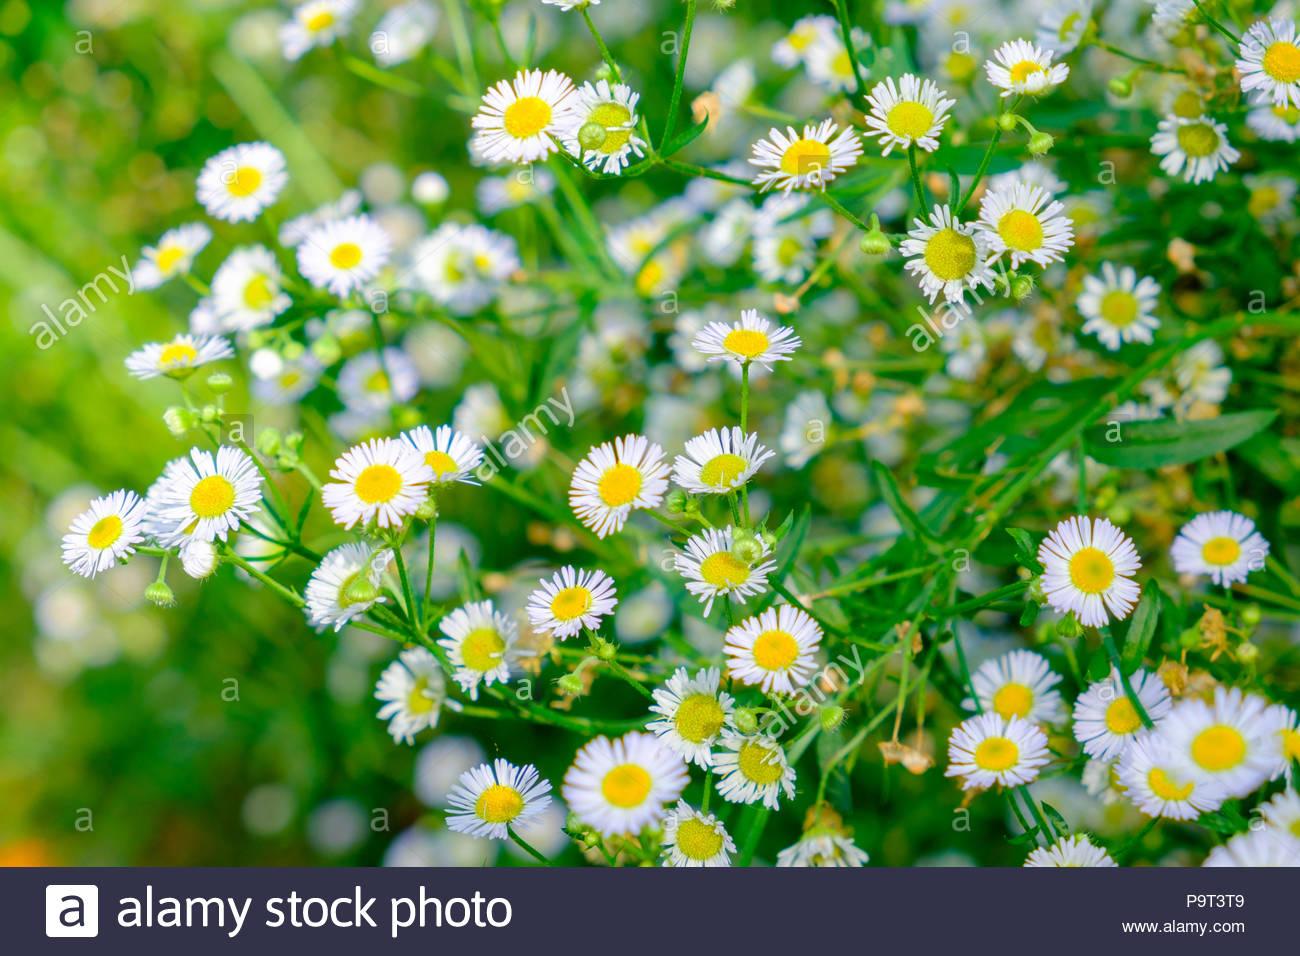 Daisy white flower yellow pollen in clump garden soft stock photo daisy white flower yellow pollen in clump garden soft izmirmasajfo